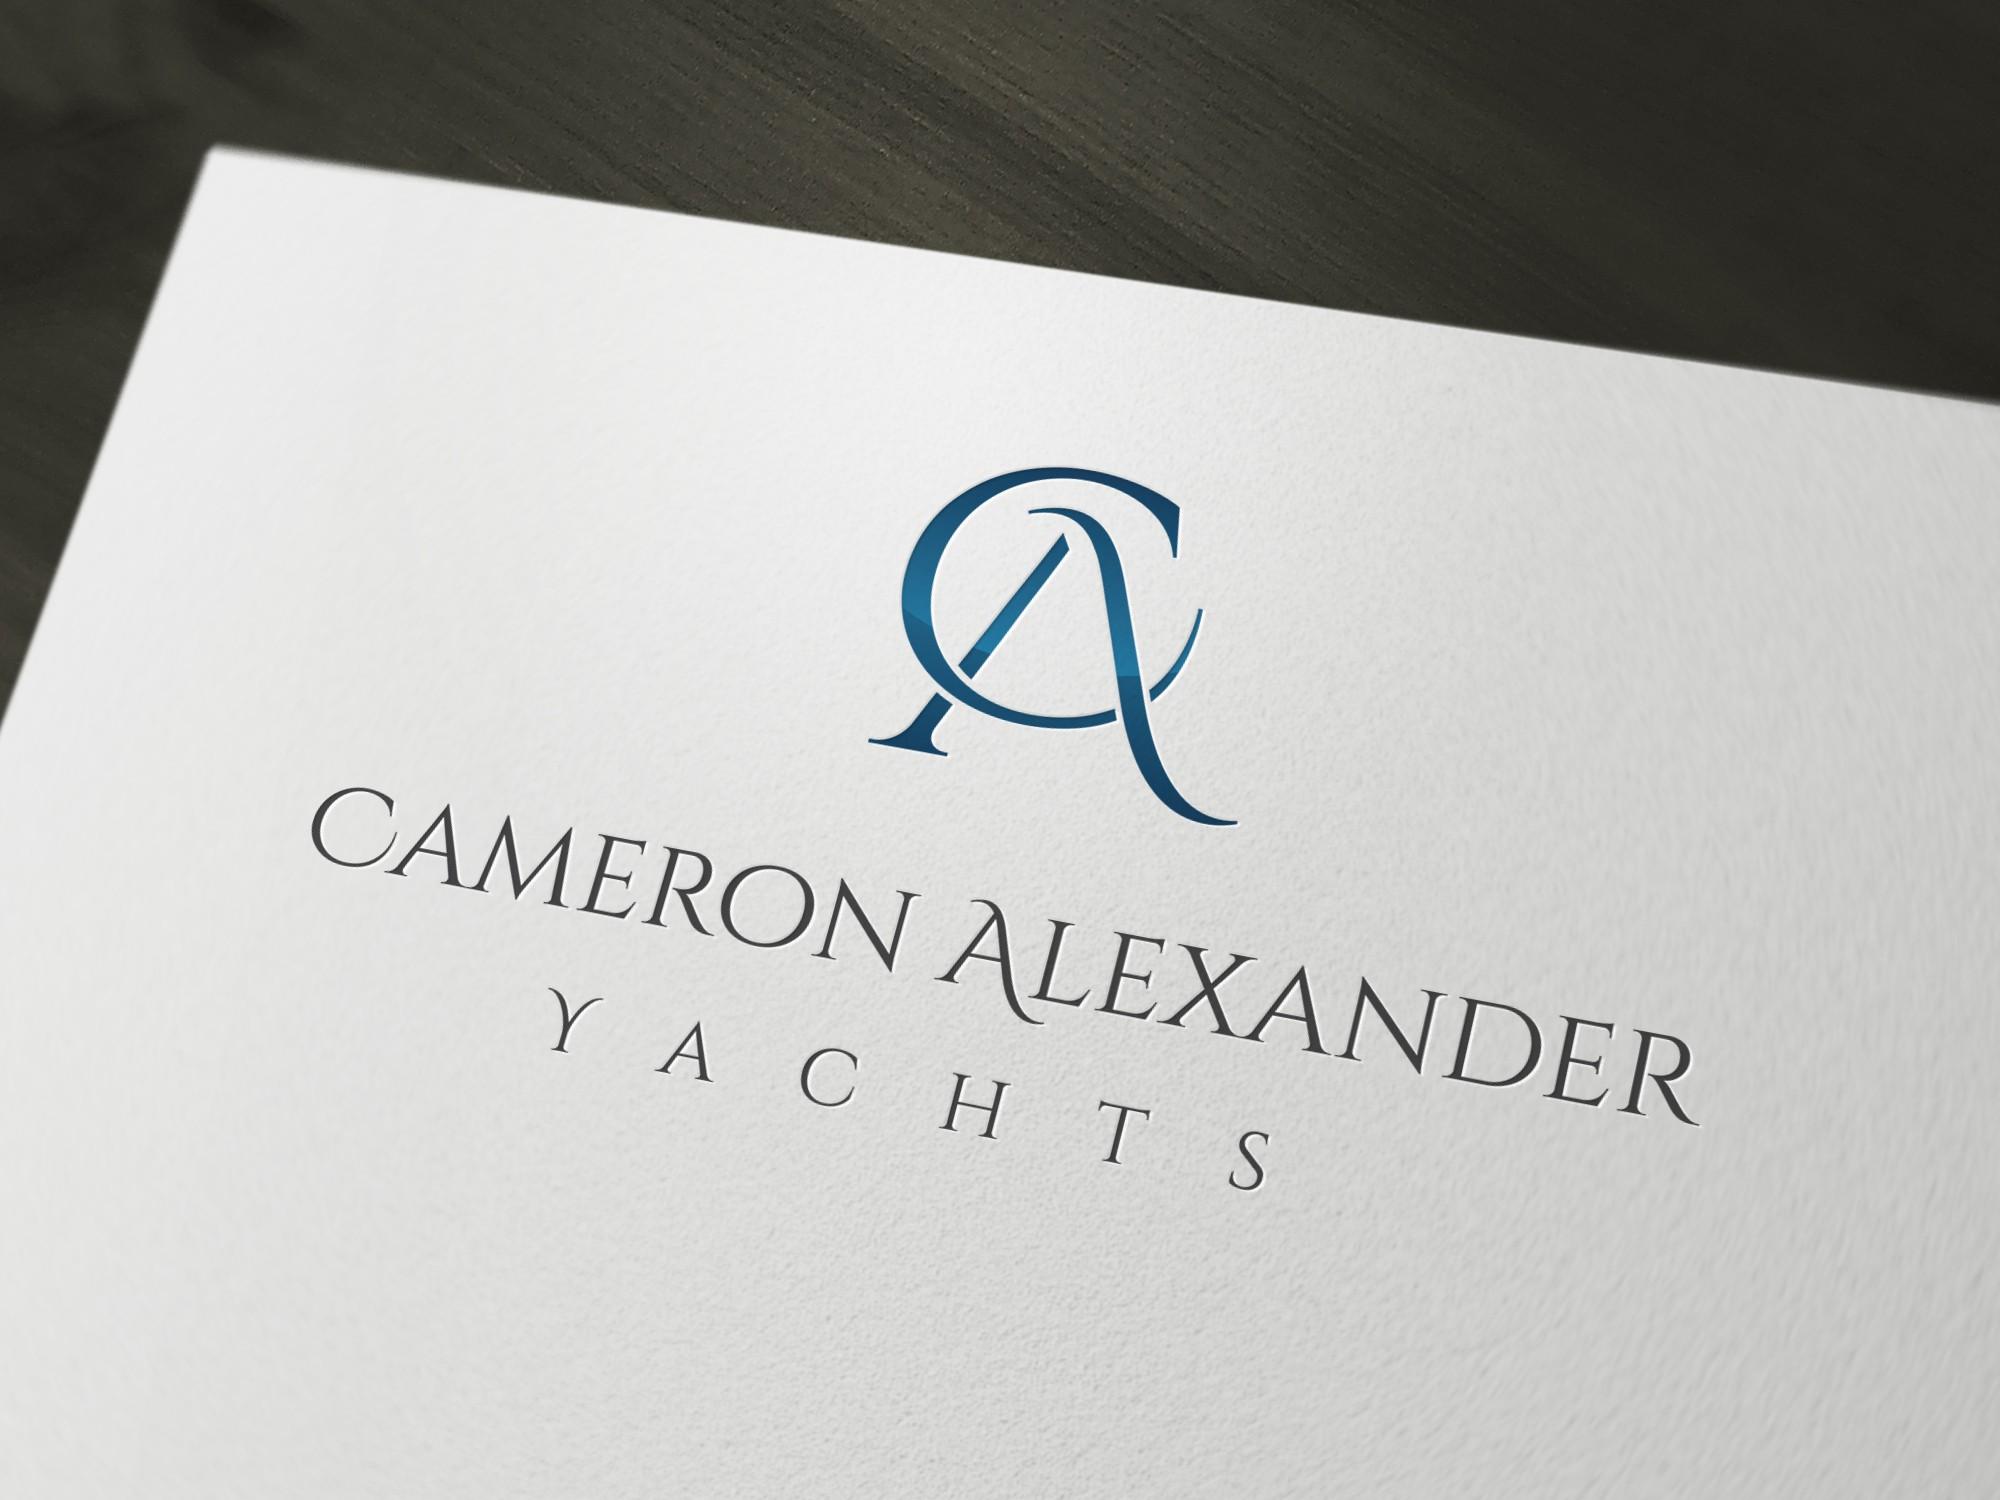 Cameron Alexander Yachts